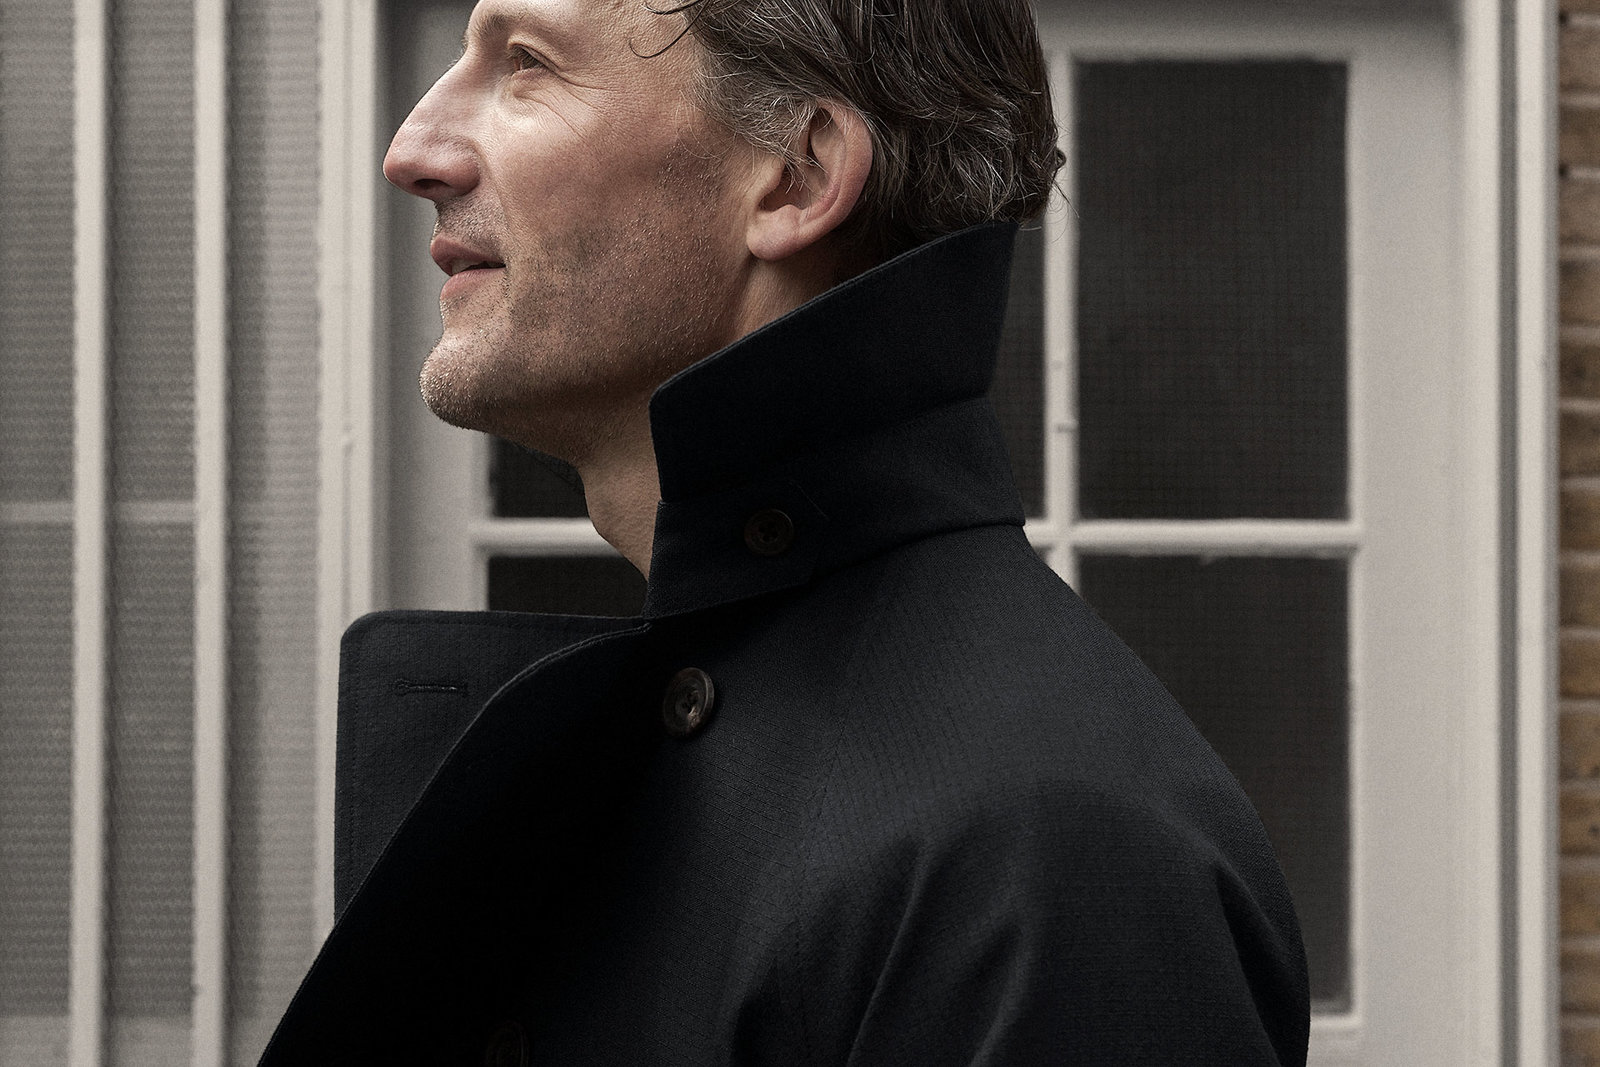 trench-coat-ripstop-cosmos-worn-1@2x.jpg